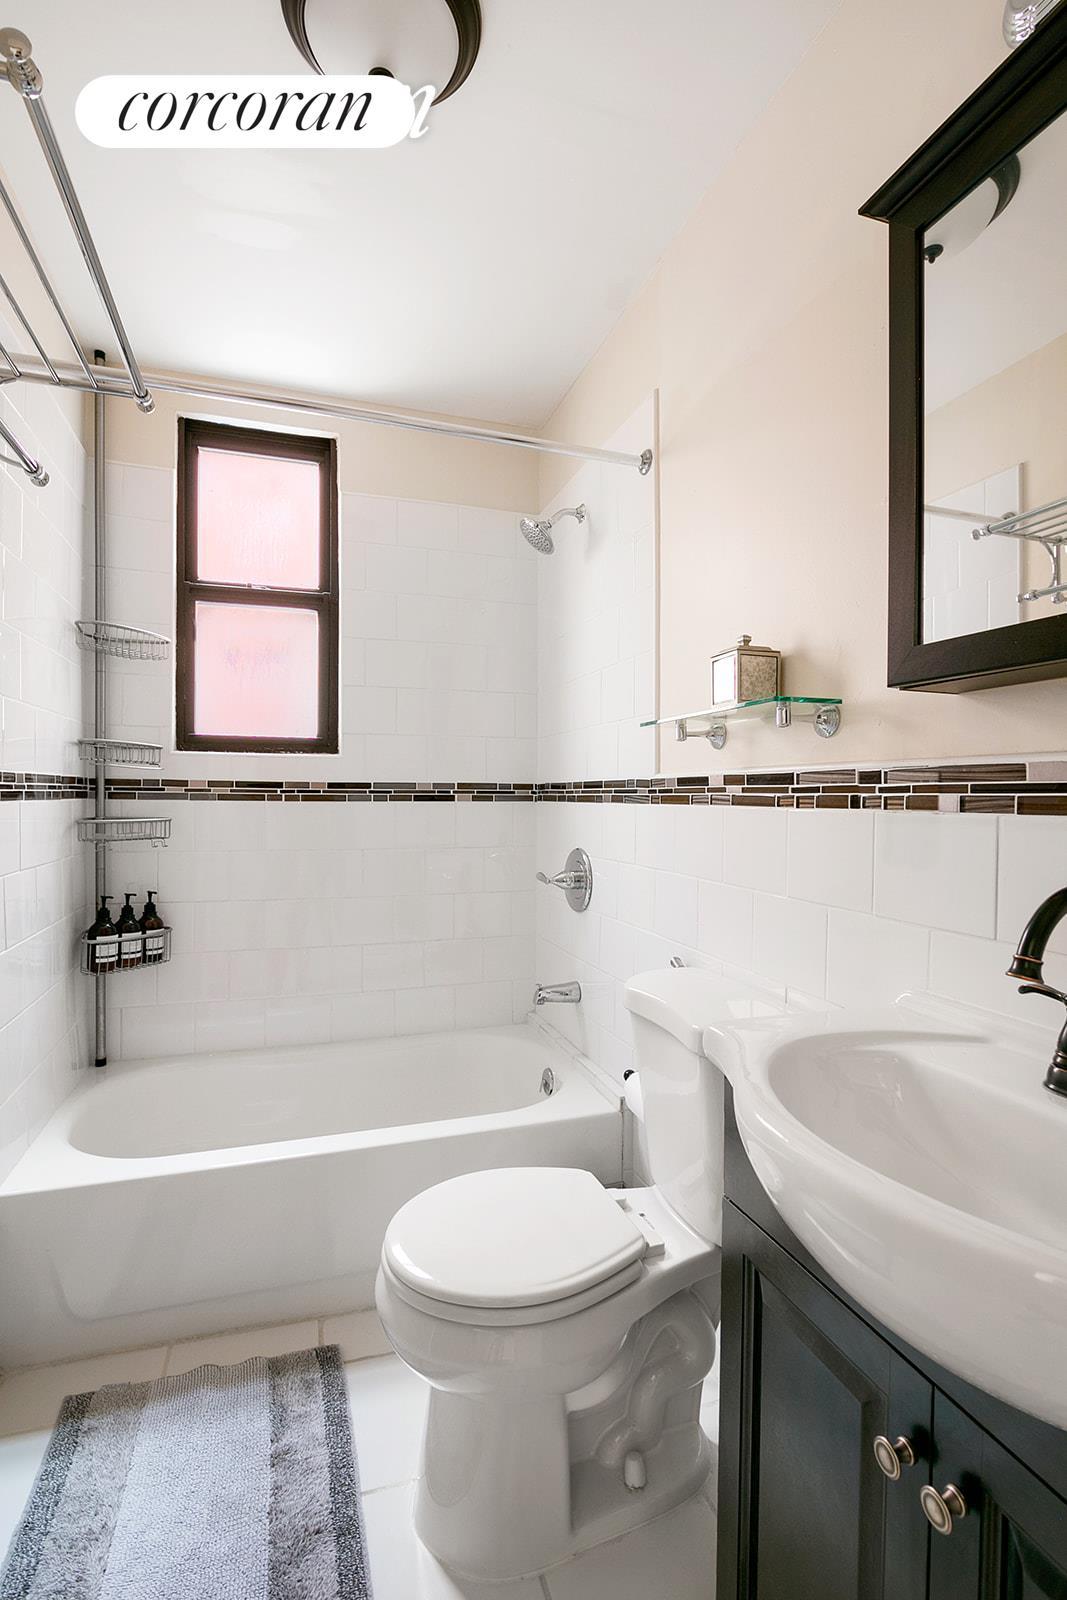 469 East 185th Street Belmont Bronx NY 10458